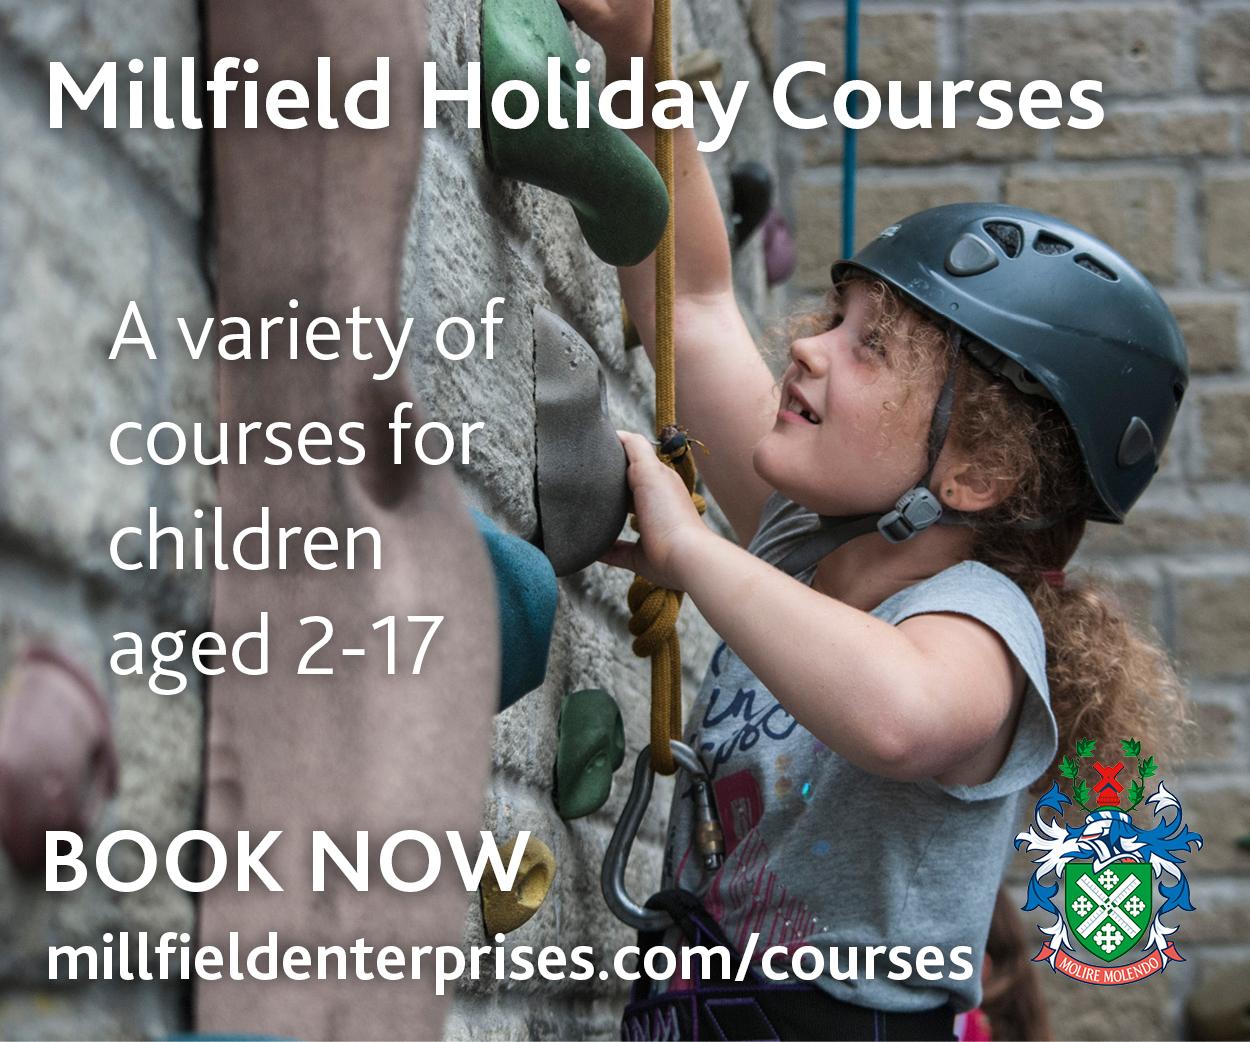 Millfield New